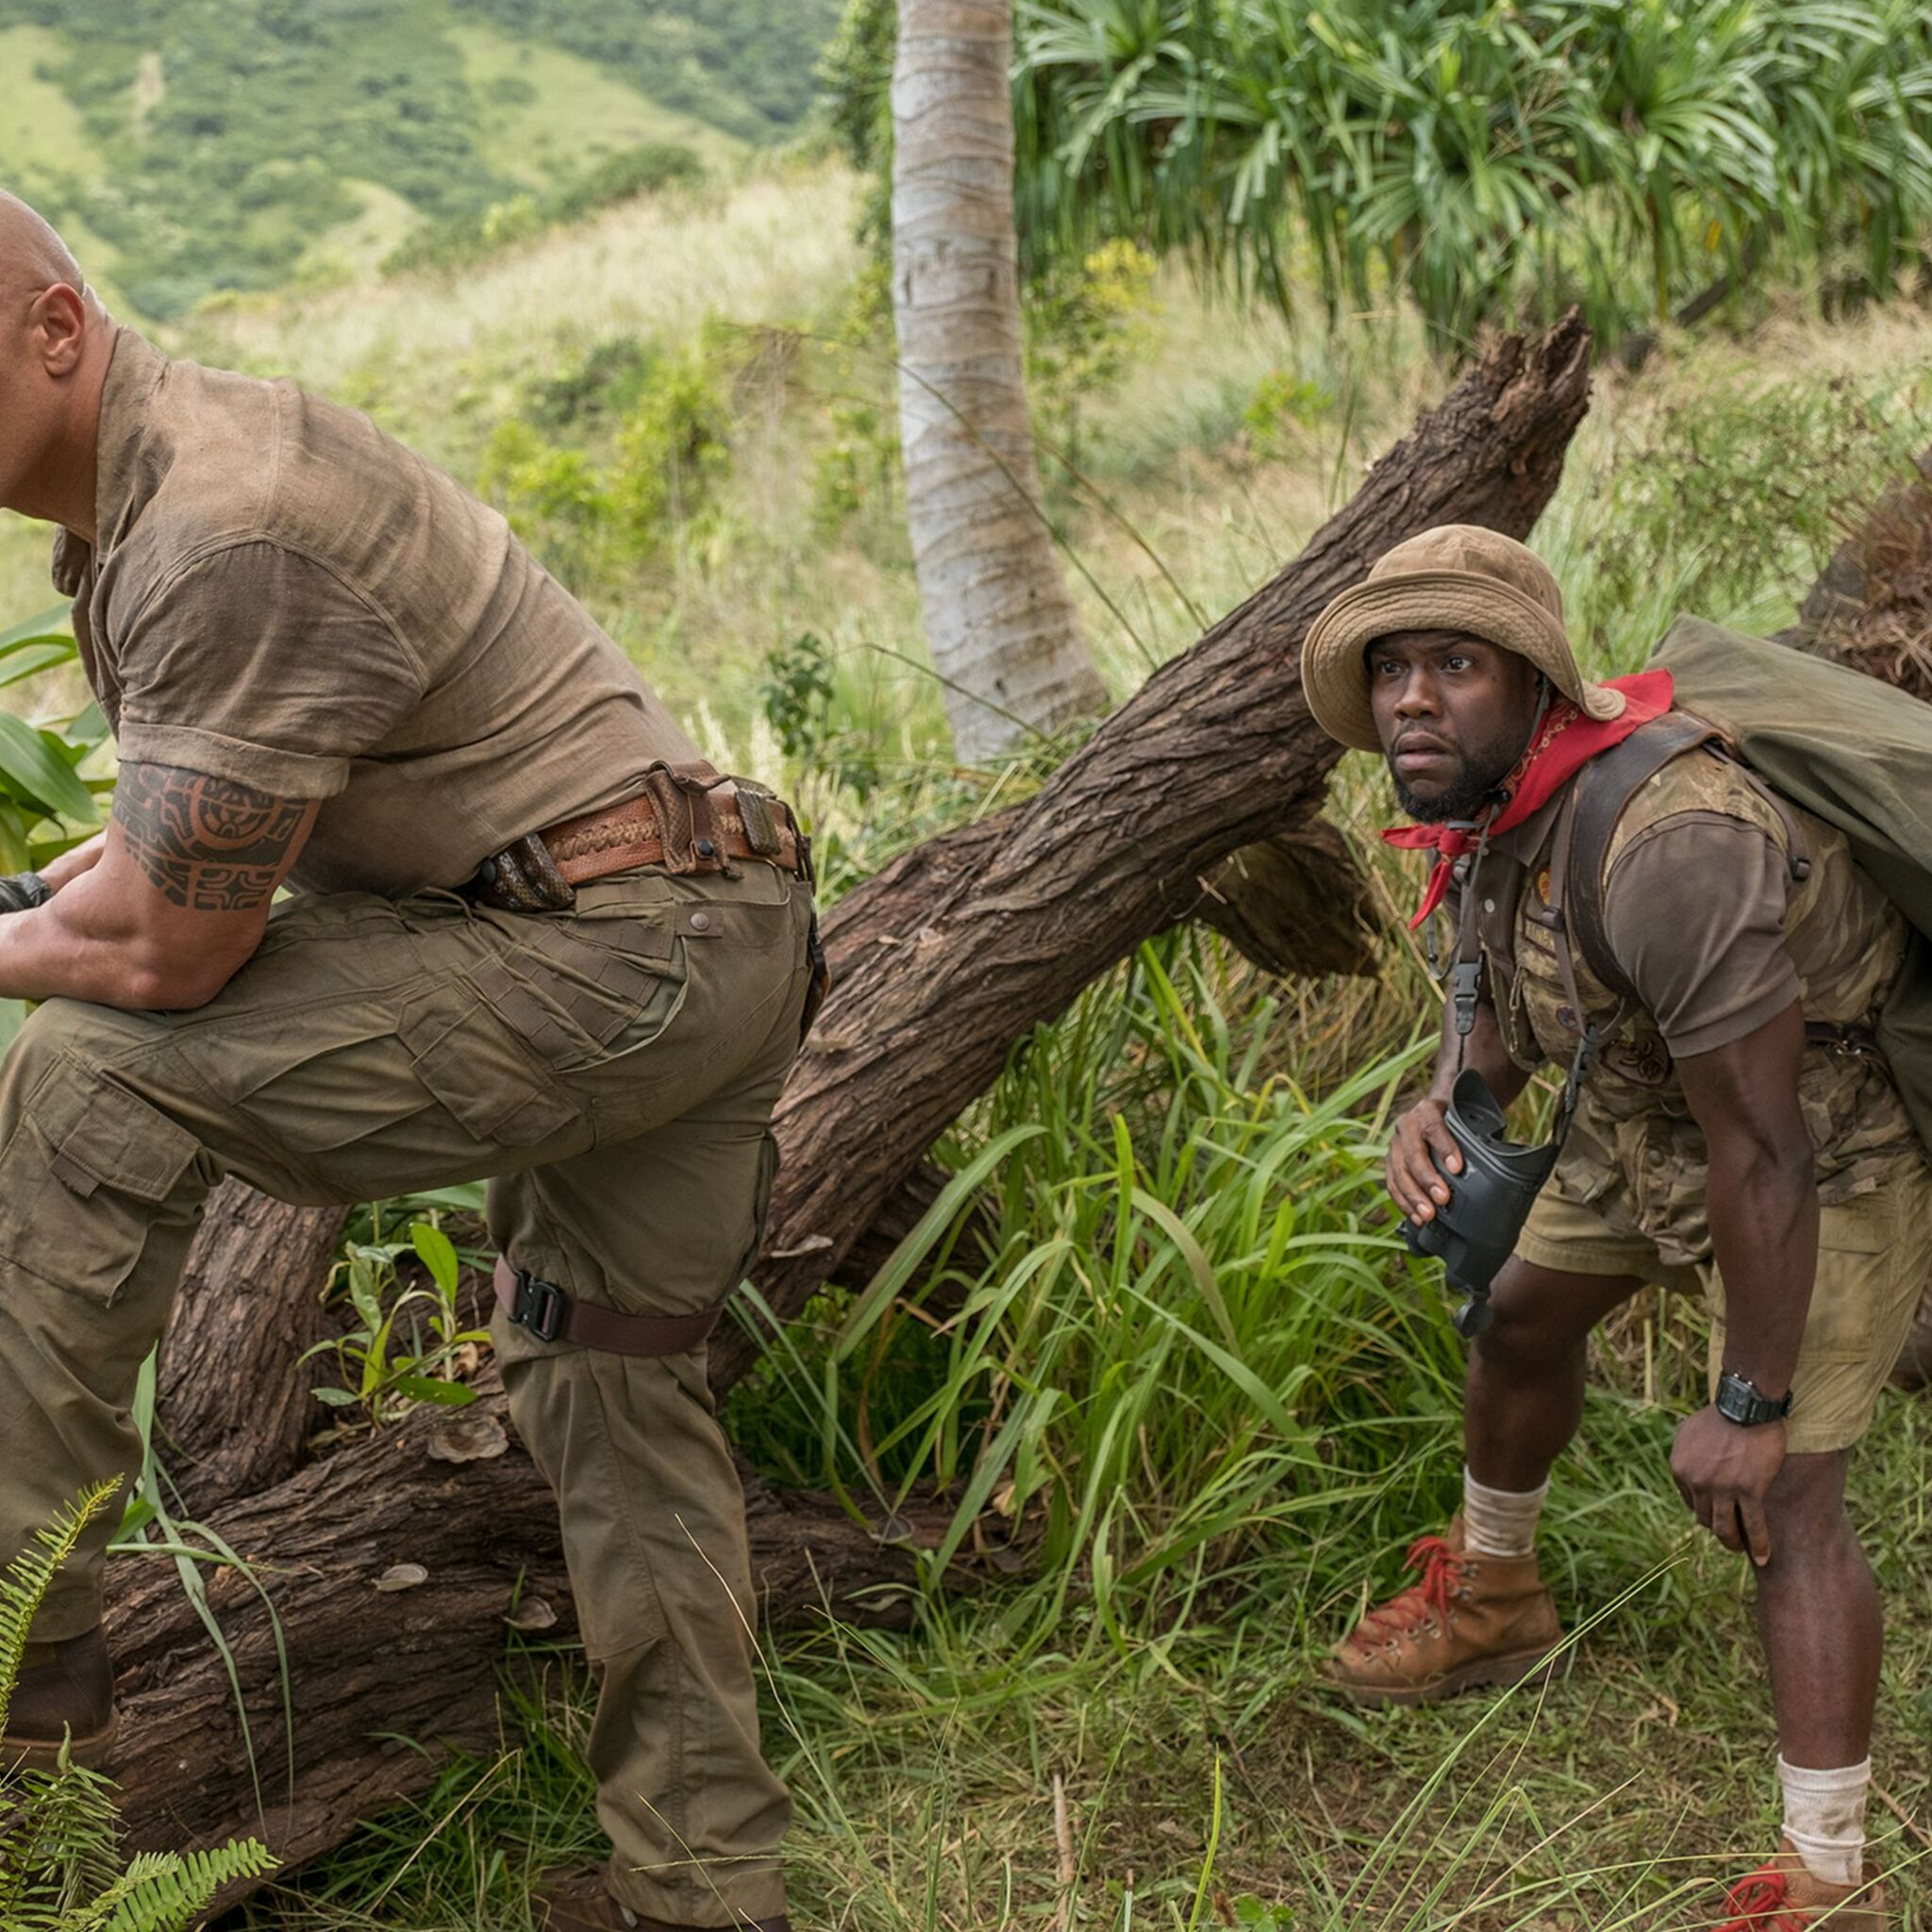 nick-jonas-kevin-hart-dwayne-johnson-jumanji-welcome-to-the-jungle-movie-92.jpg